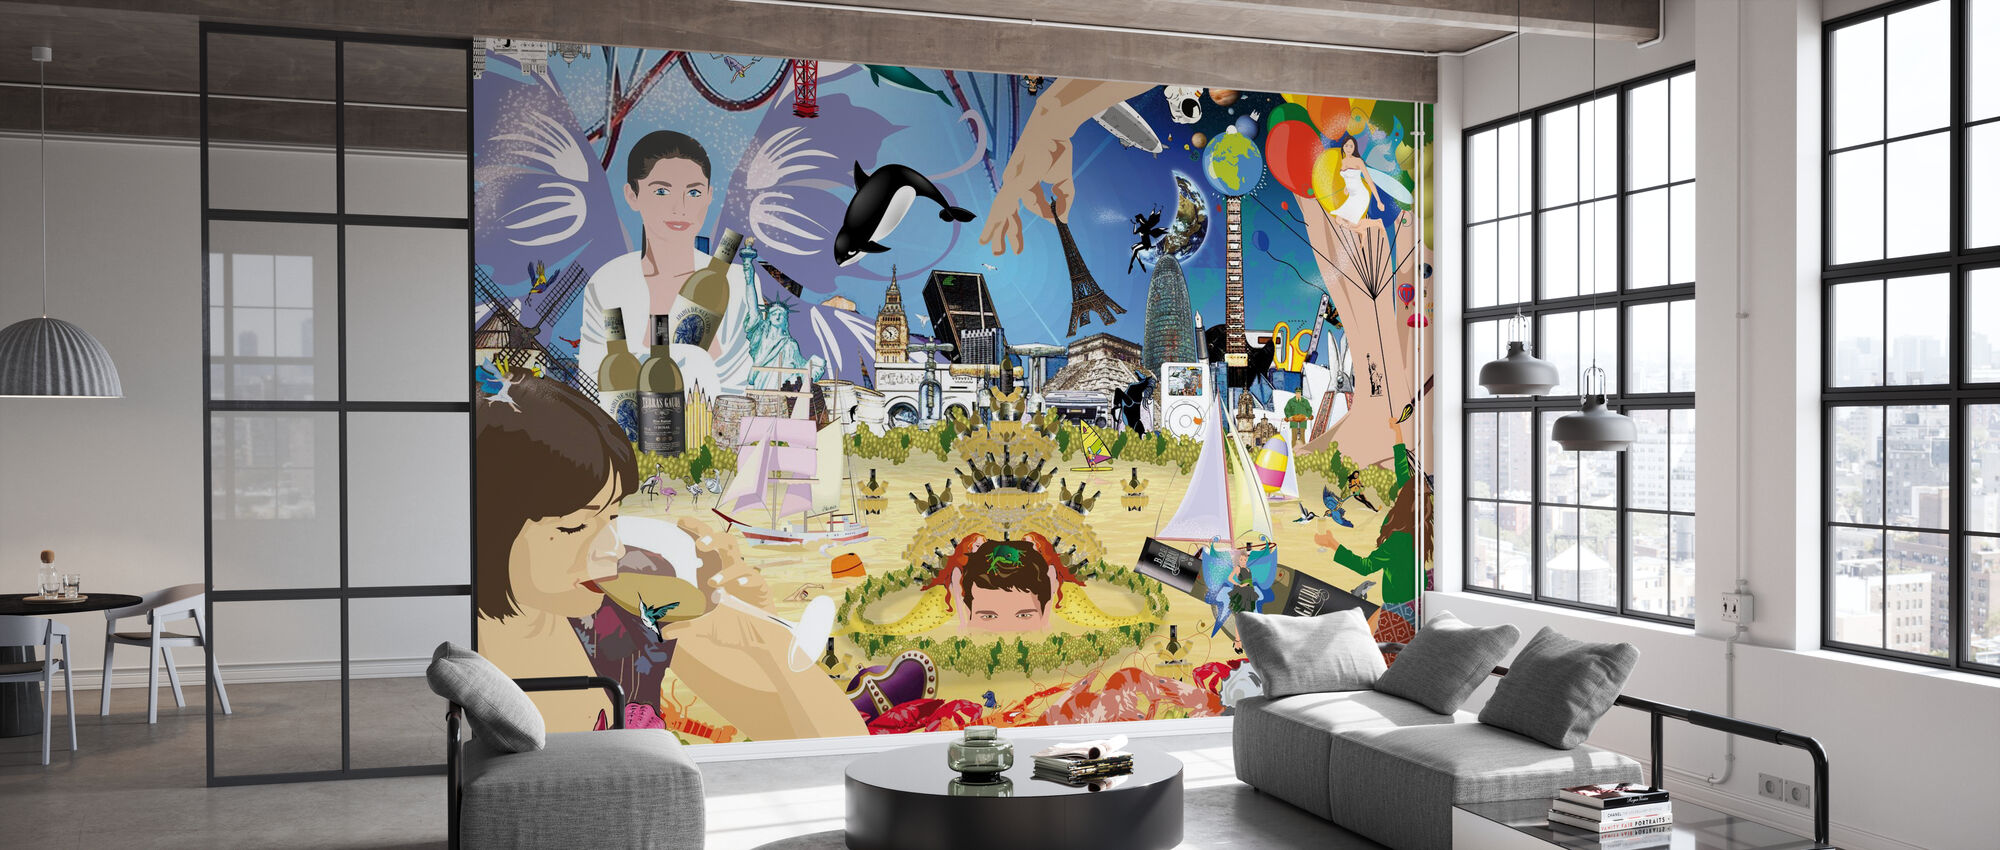 Bacchus - Wallpaper - Office